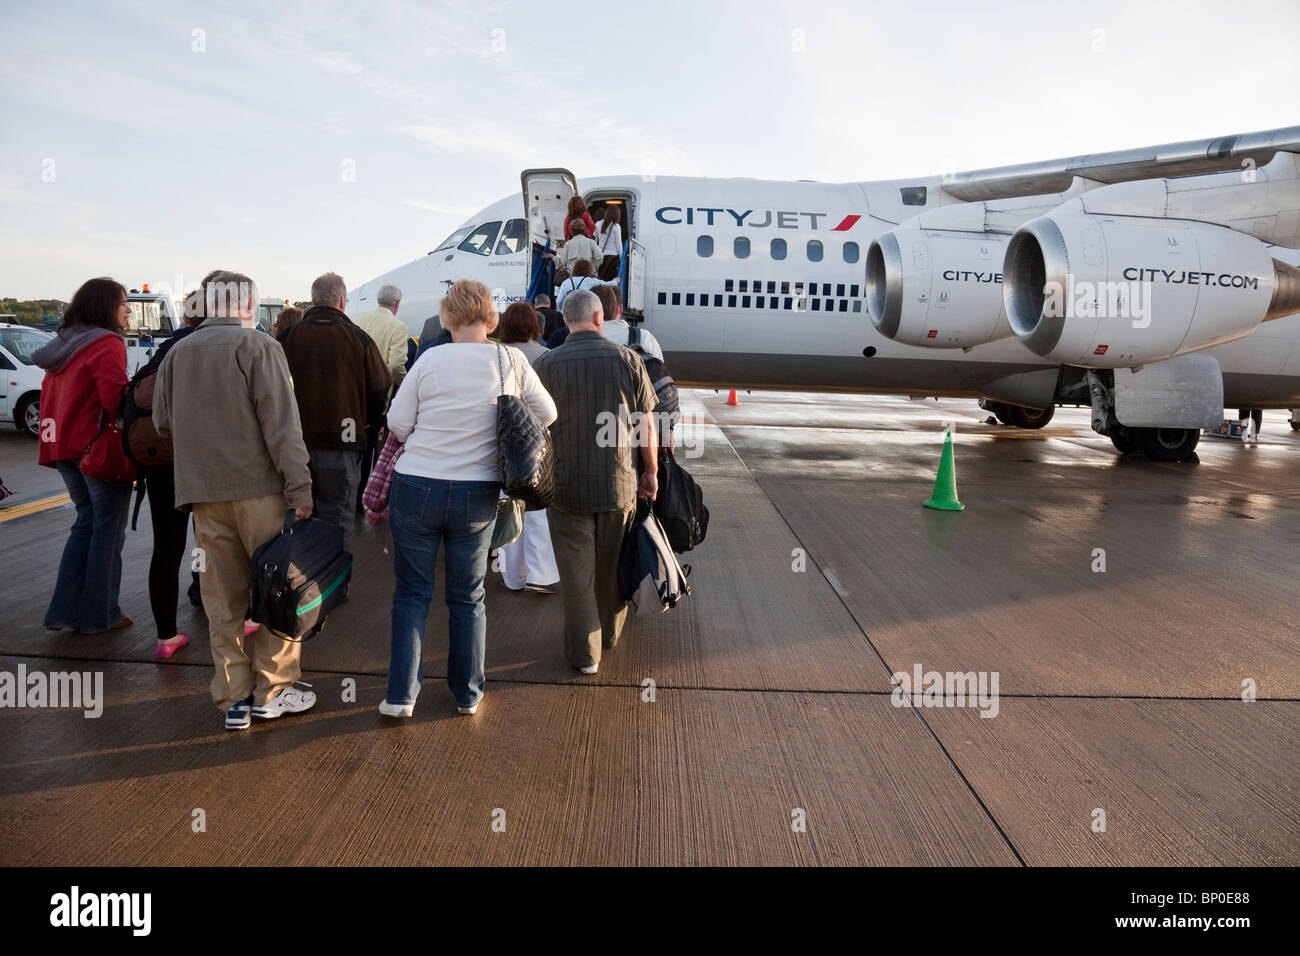 People boarding a CityJet aeroplane at Edinburgh Airport - Stock Image